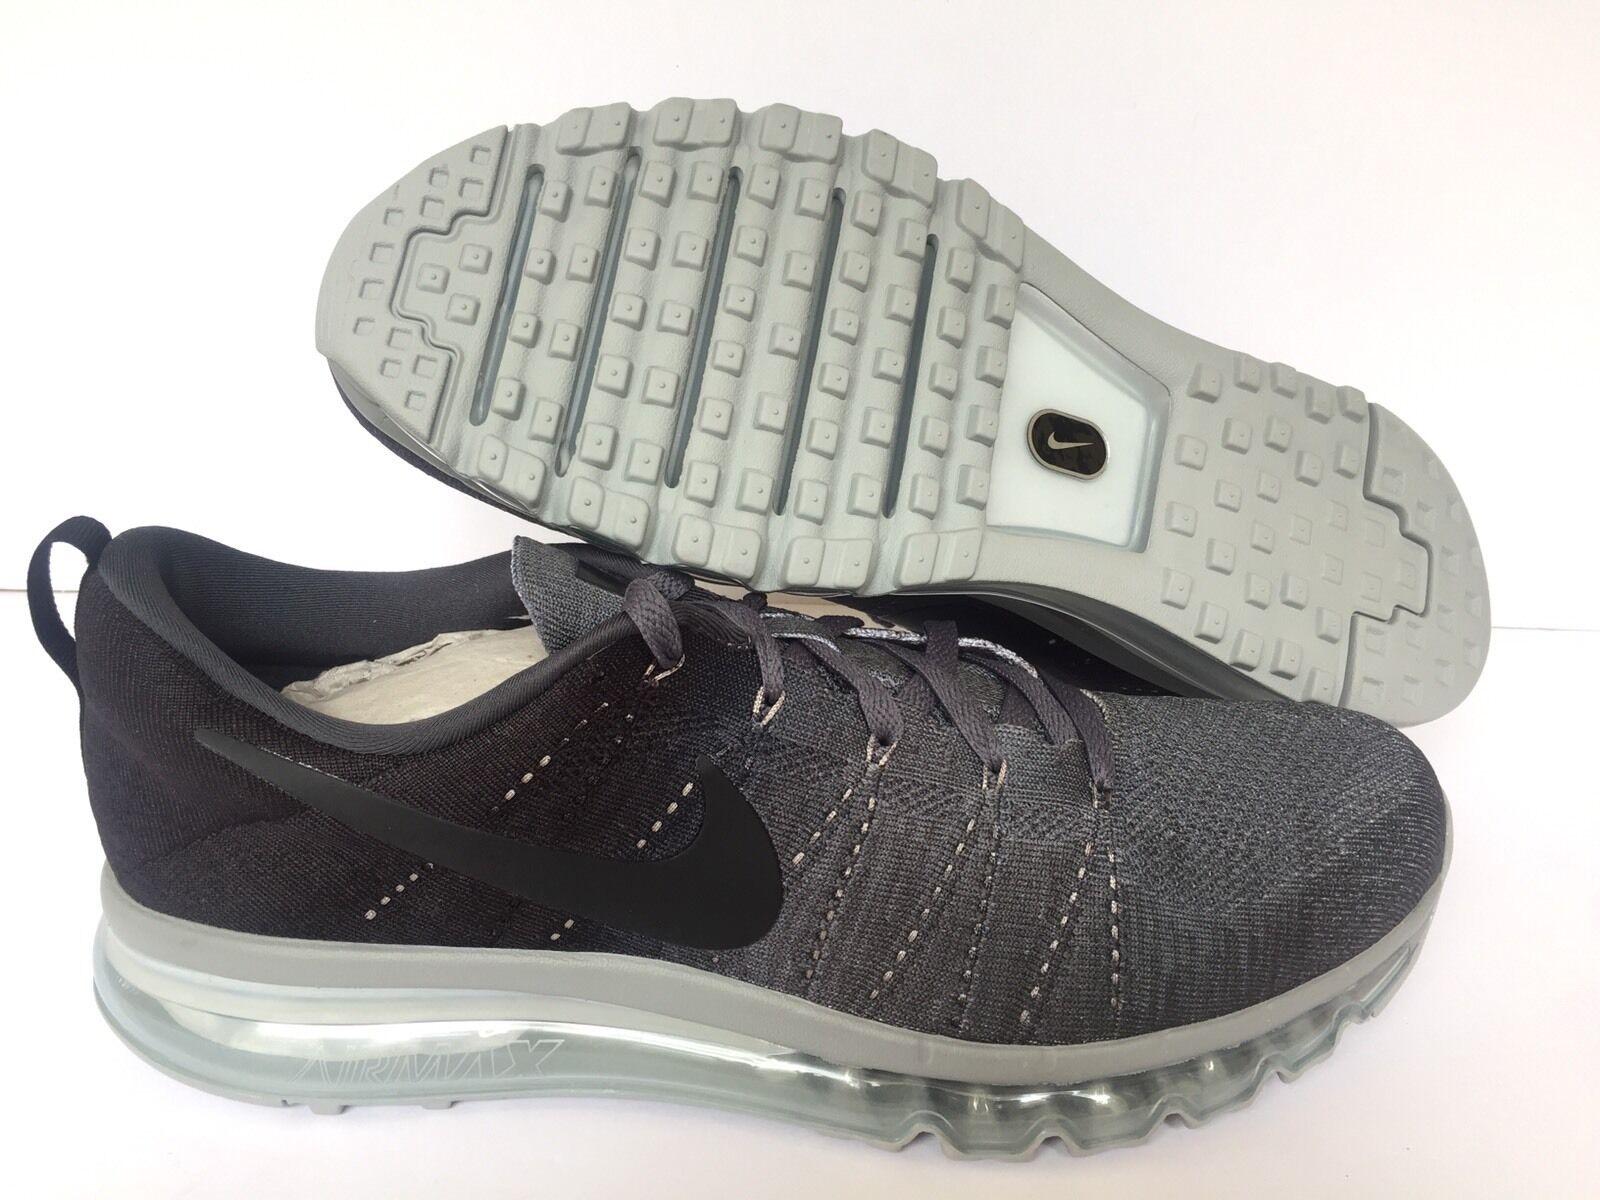 Nikeid air max flyknit - nero / grigio - flyknit 845615-992. noi uomini sz 13 04c7f5